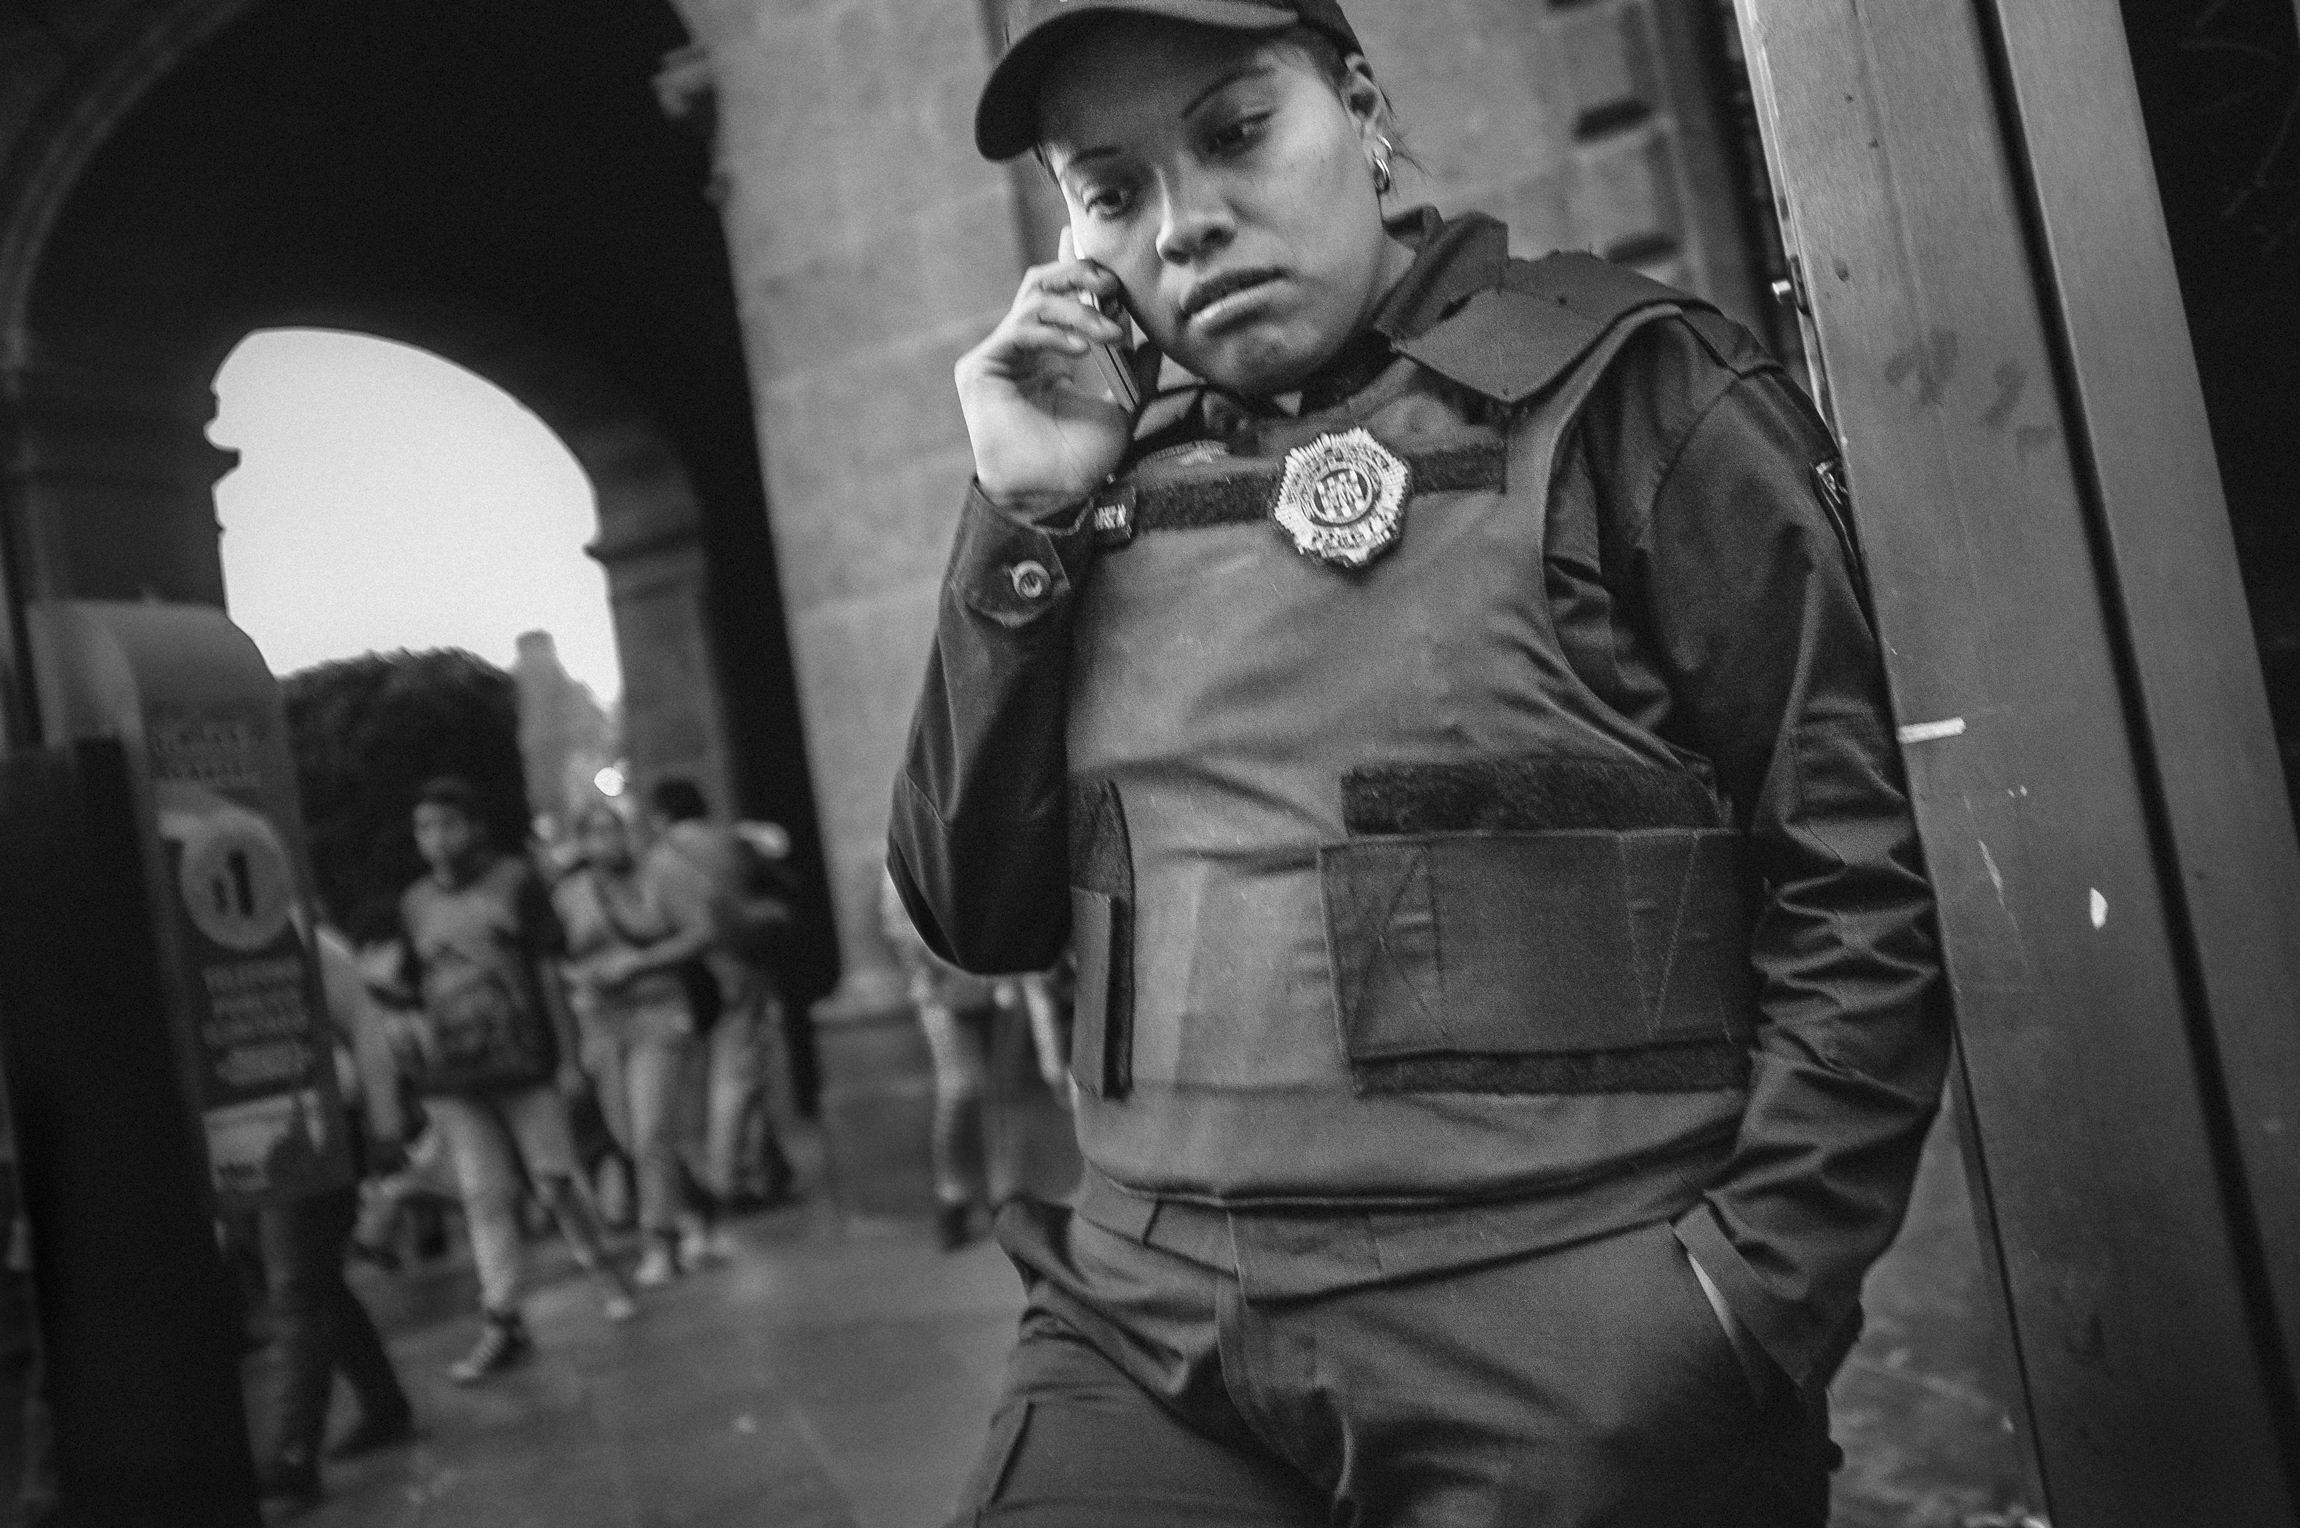 Poli Comunicado